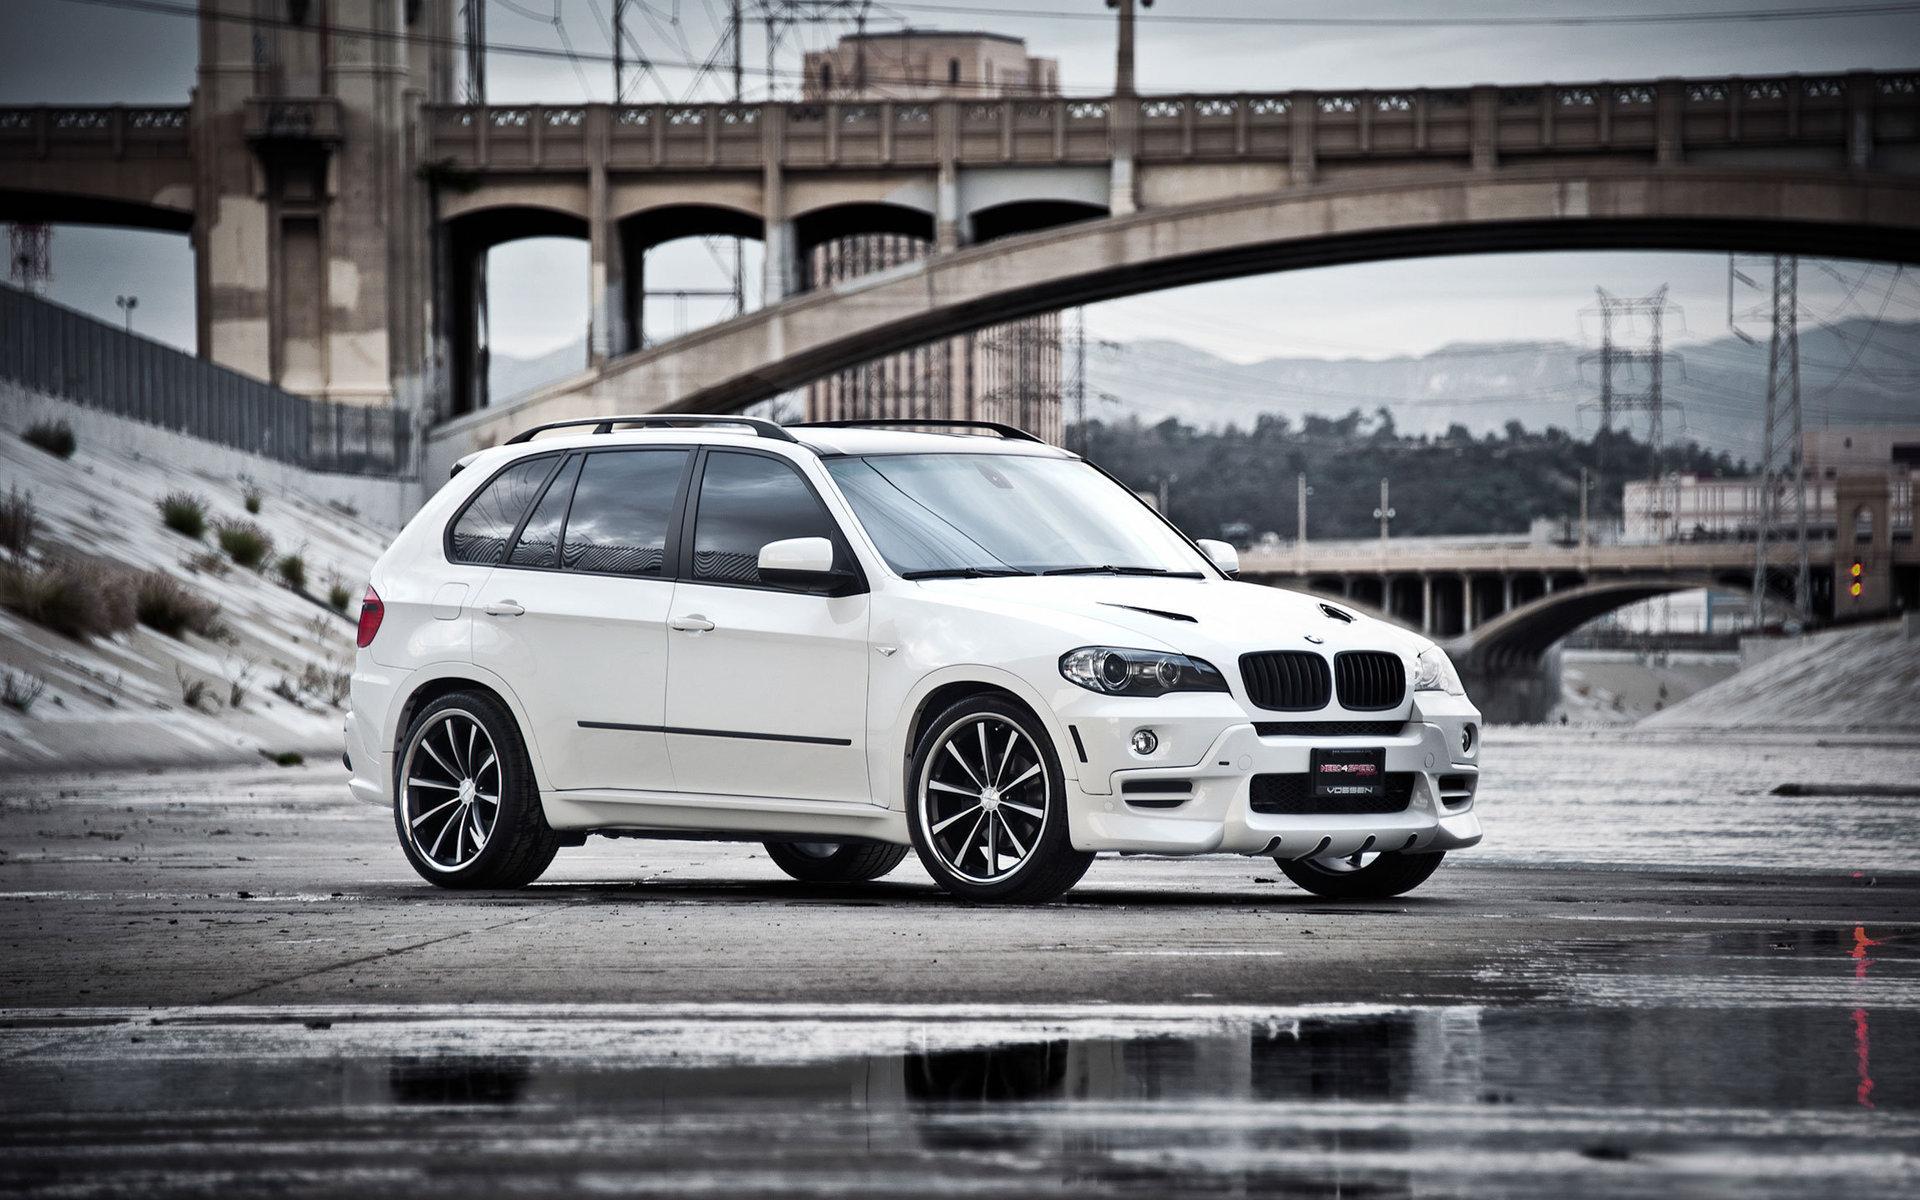 BMW X5 White - обои для рабочего стола, картинки, фото